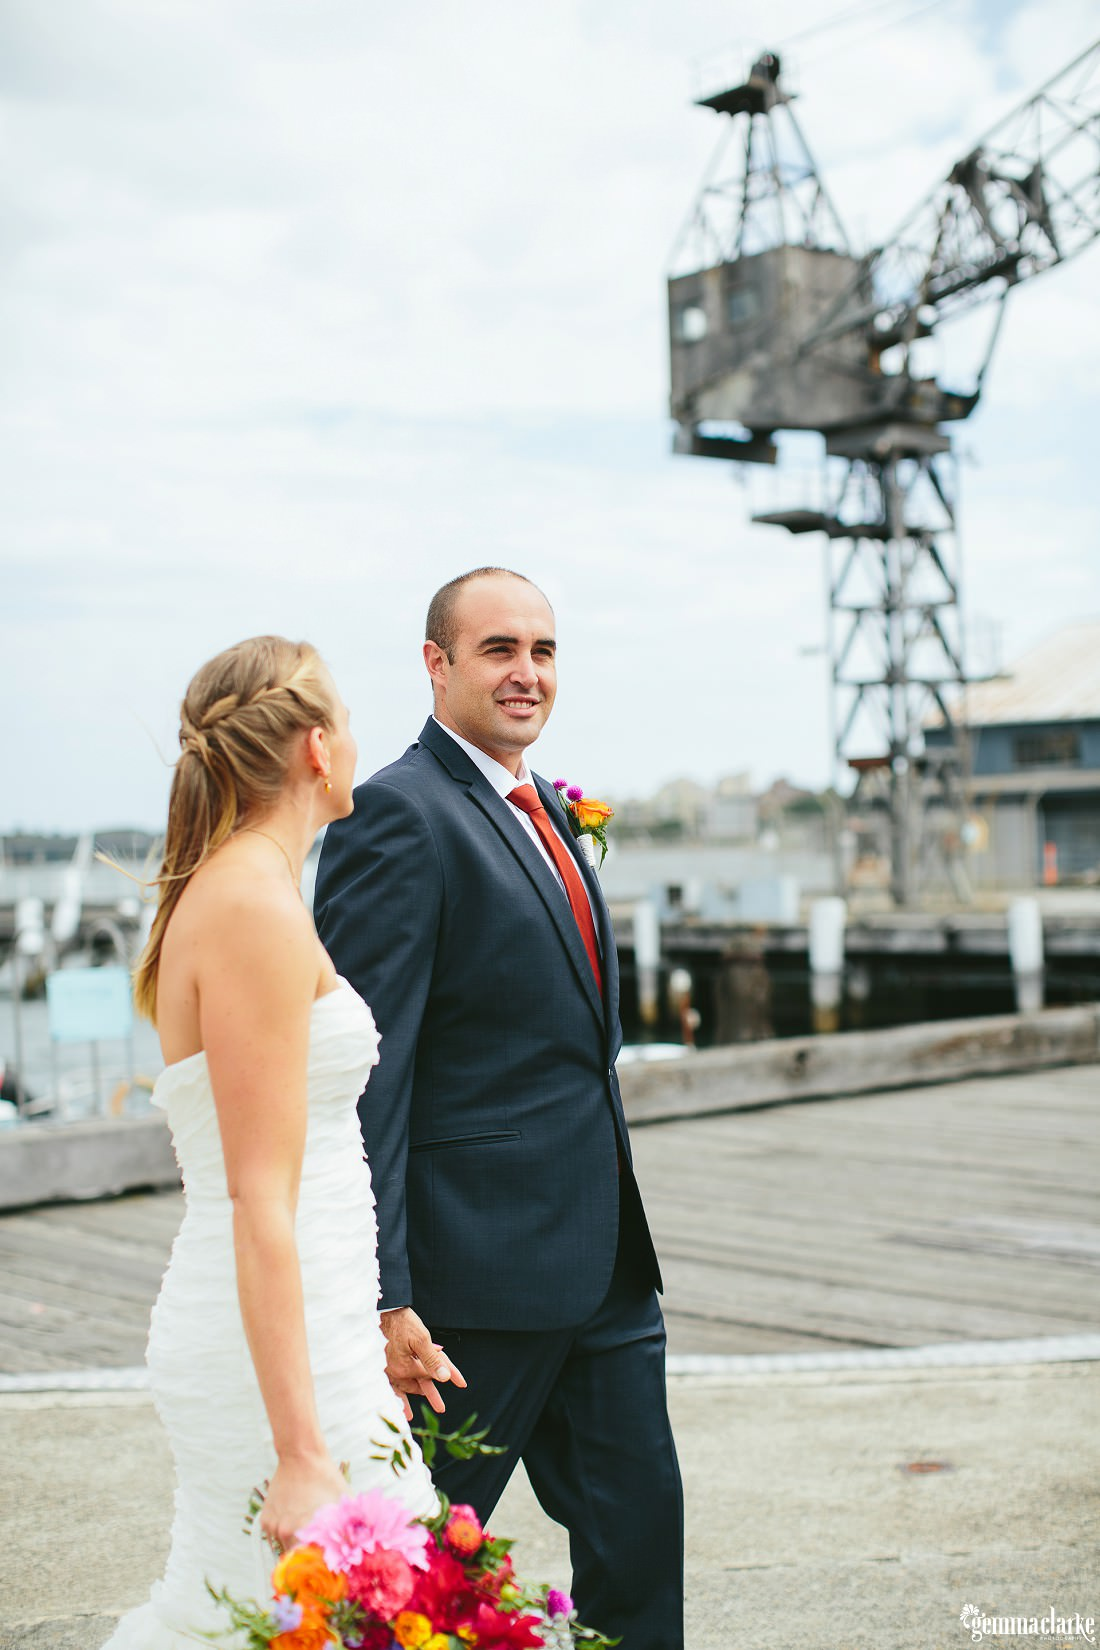 gemmaclarkephotography_cockatoo-island-wedding-photos_the-bar-at-the-end-of-the-wharf_0030